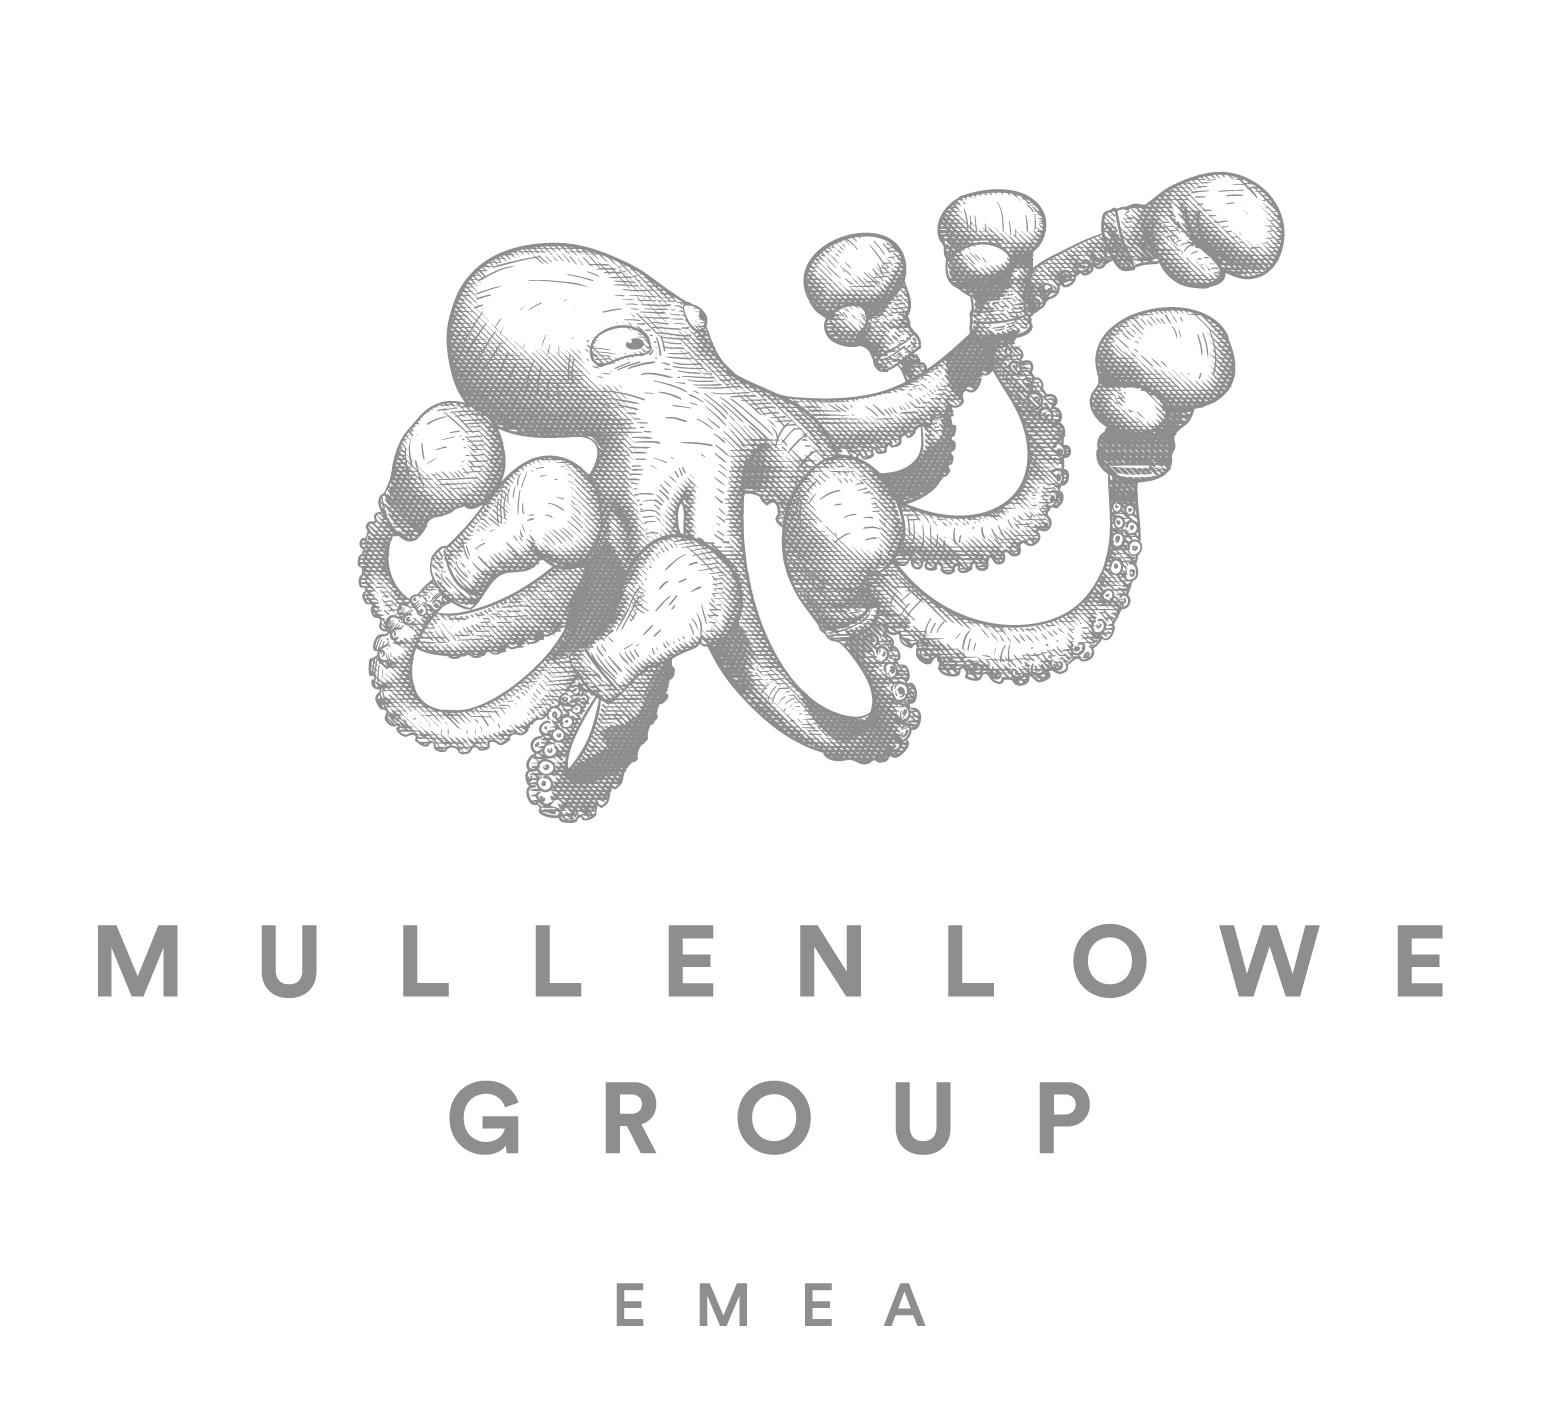 MullenLowe EMEA